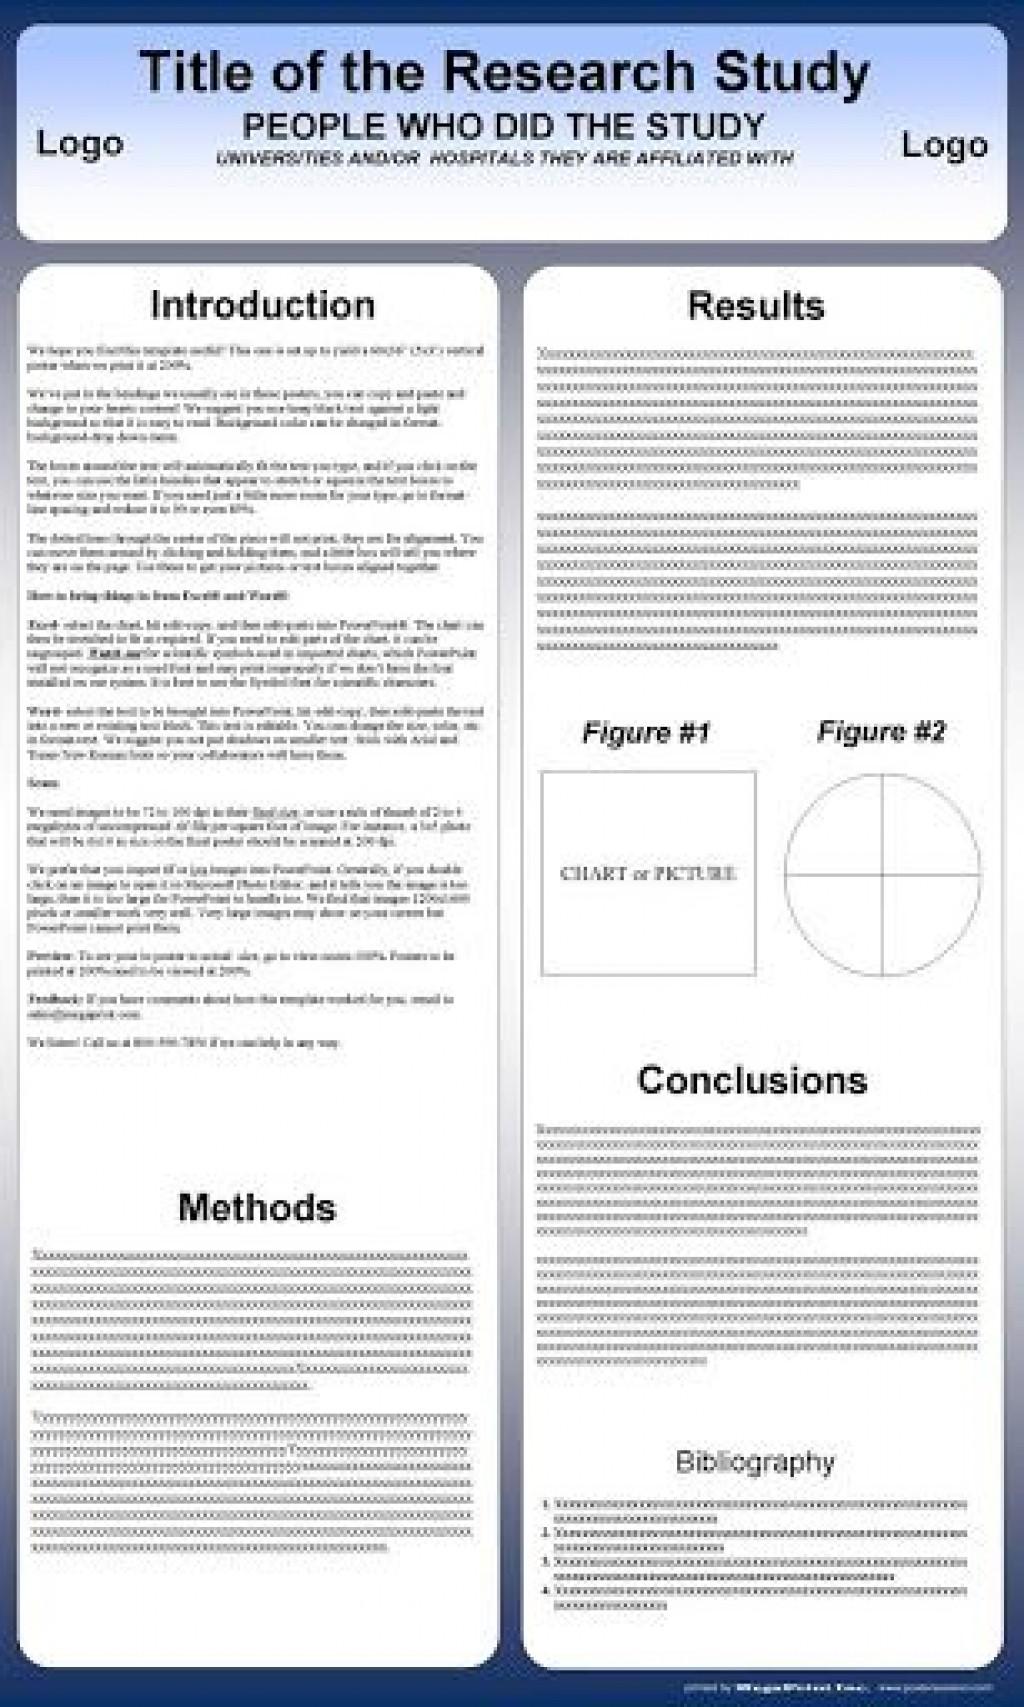 009 Impressive Scientific Poster Design Template Free Download Example Large